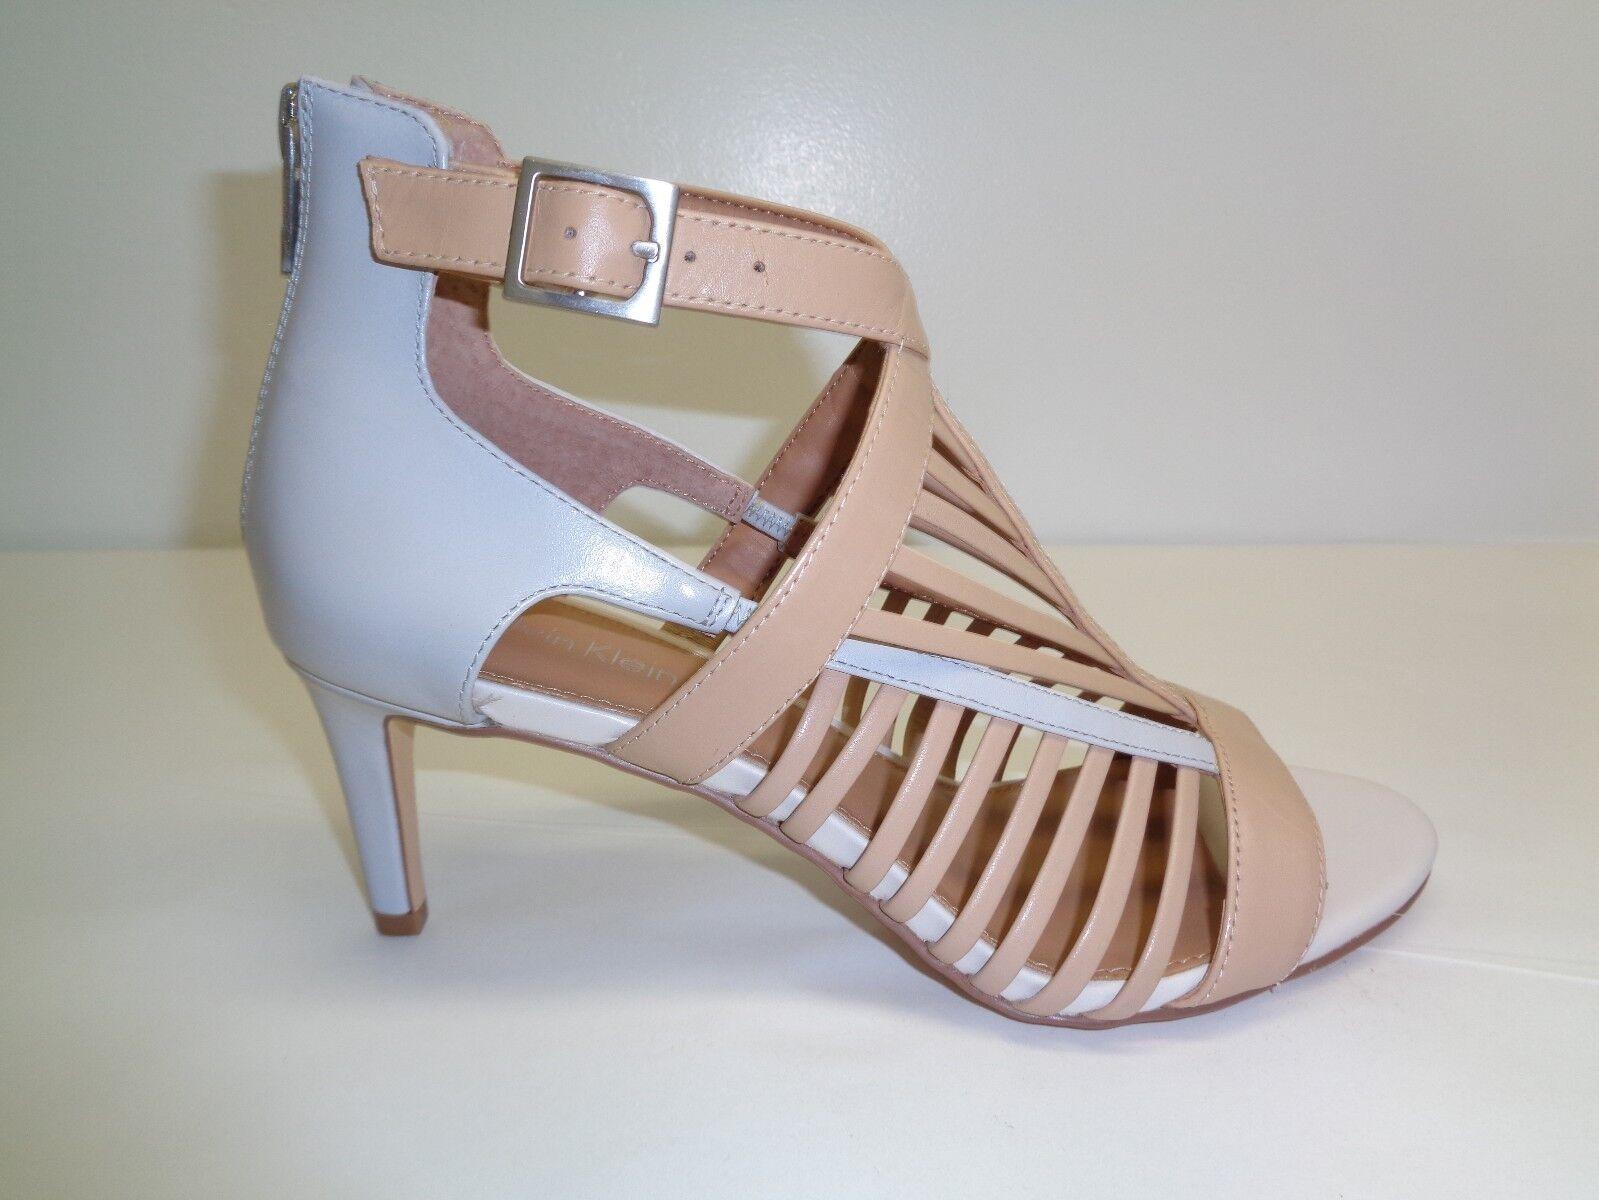 Calvin Klein Größe 8.5 M CAMELLA Sandstorm Gray Leder Sandales NEU Damenschuhe Schuhes